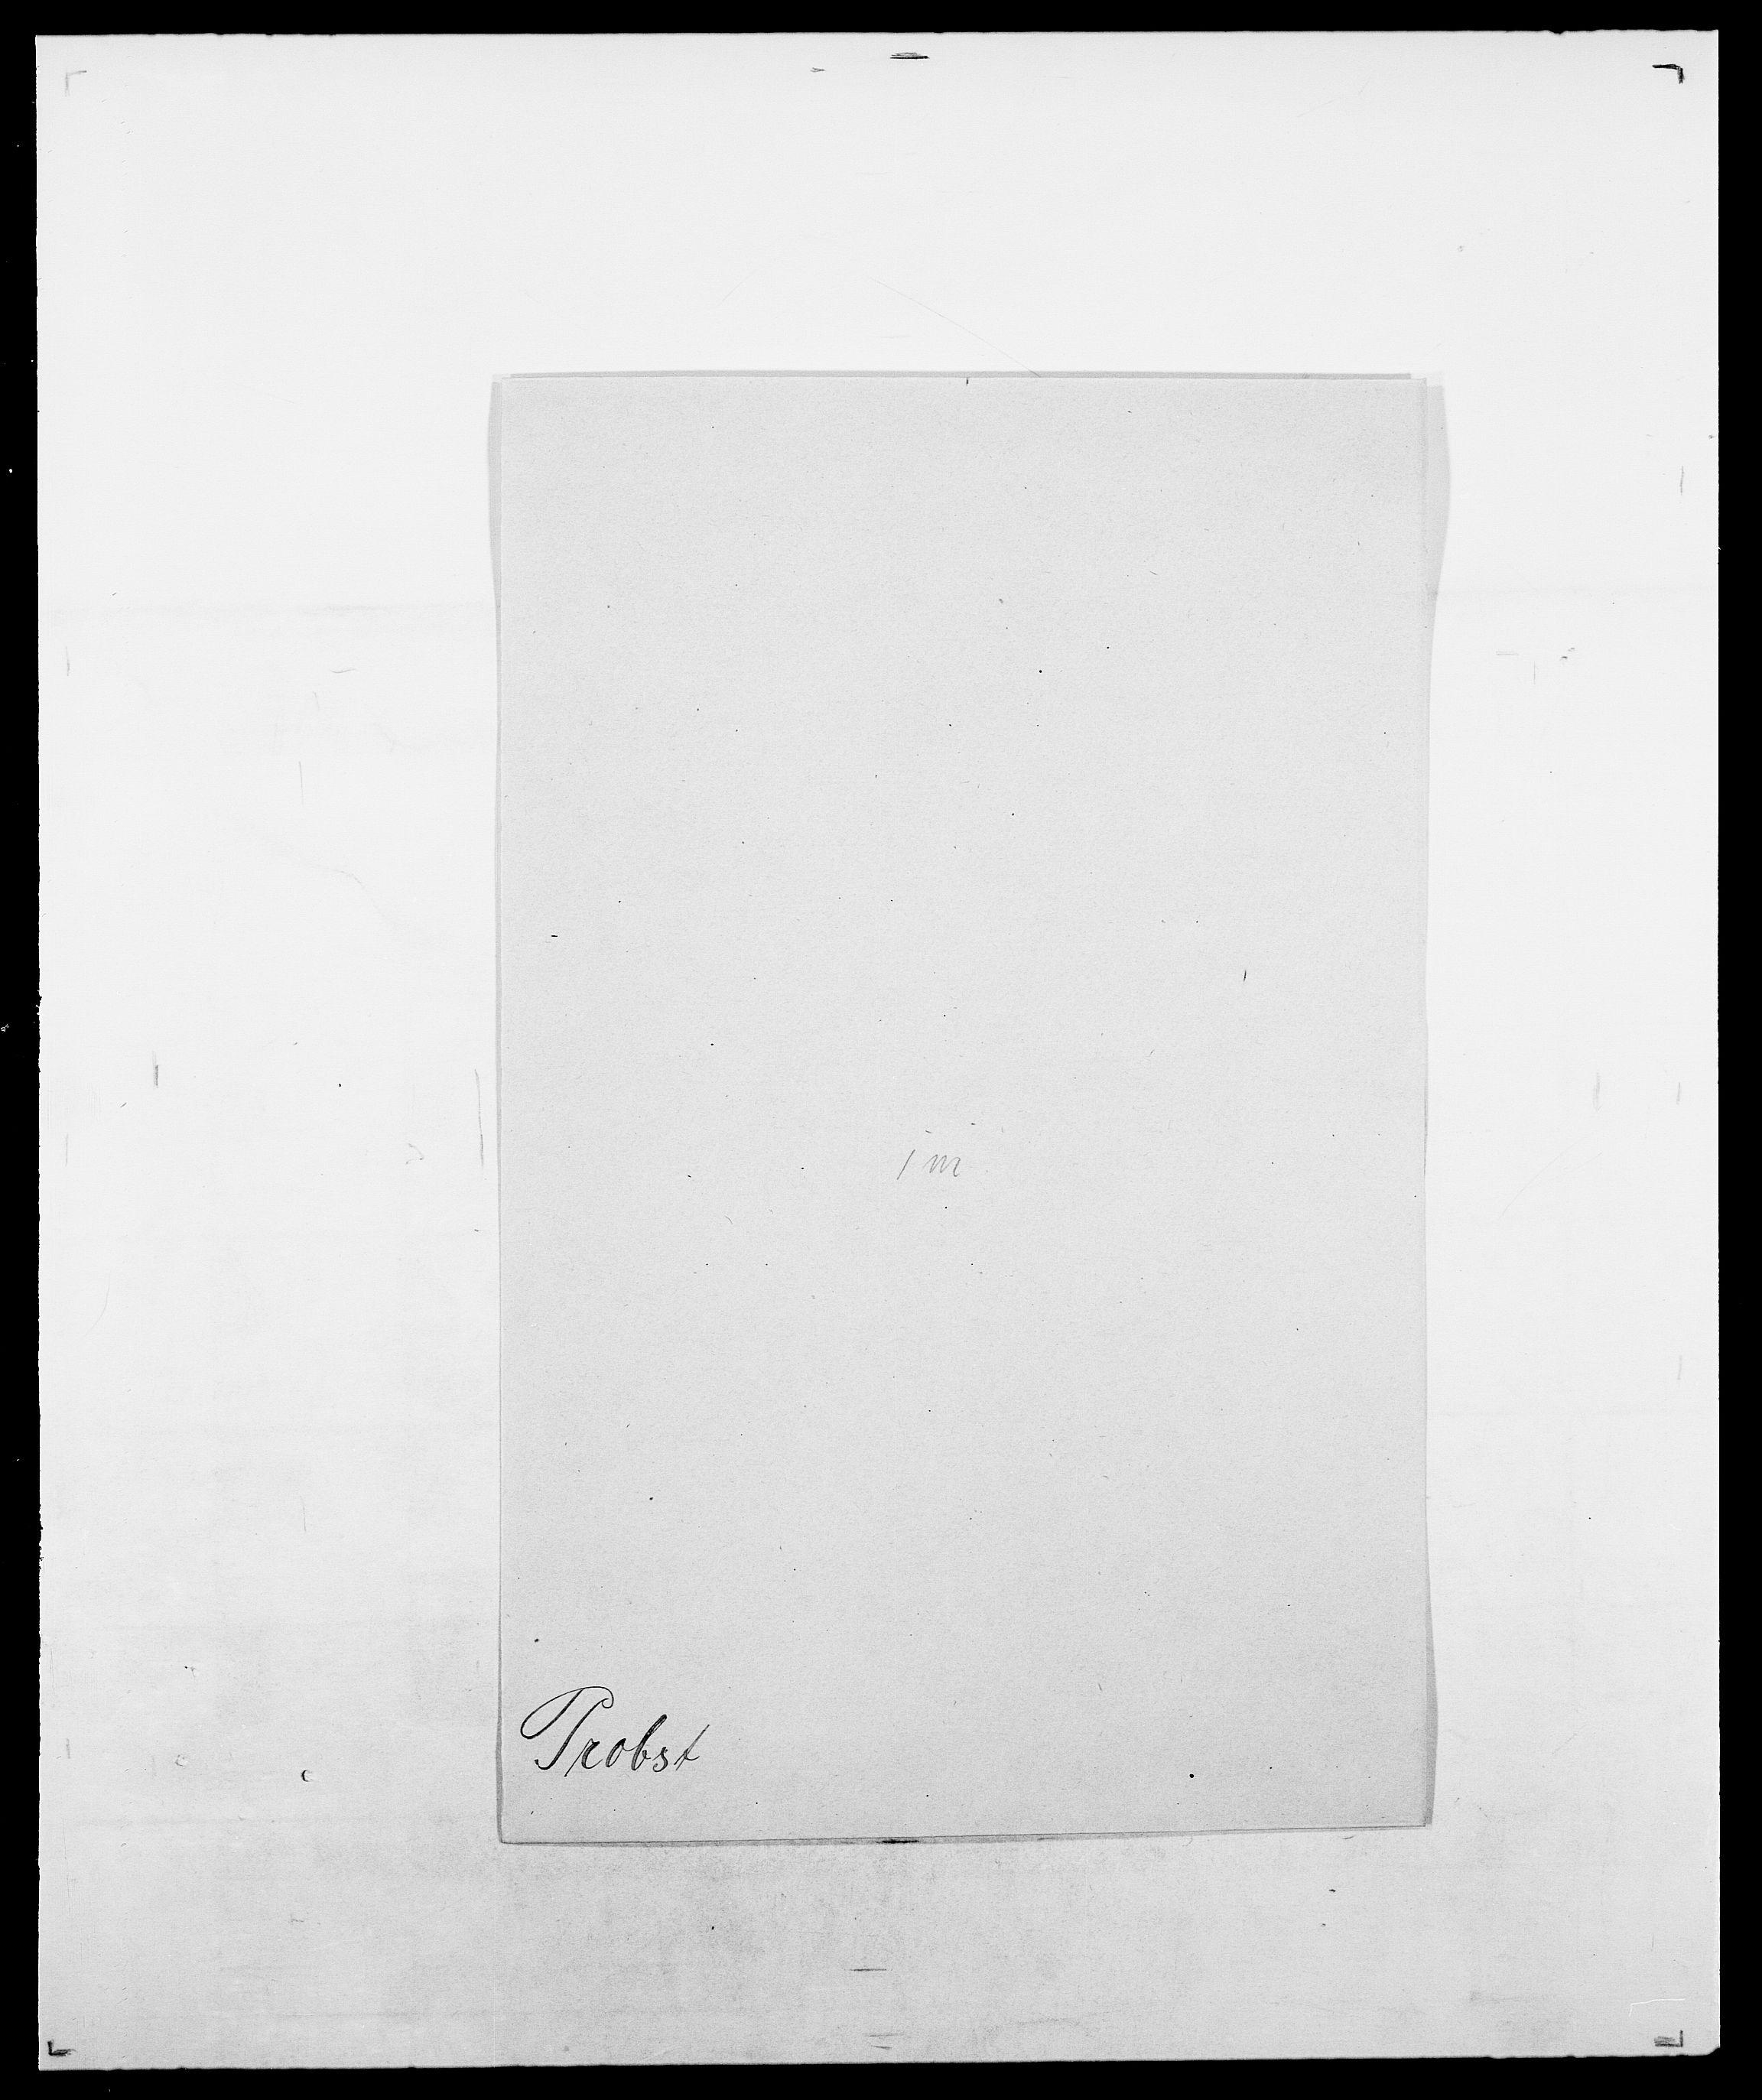 SAO, Delgobe, Charles Antoine - samling, D/Da/L0031: de Place - Raaum, s. 361